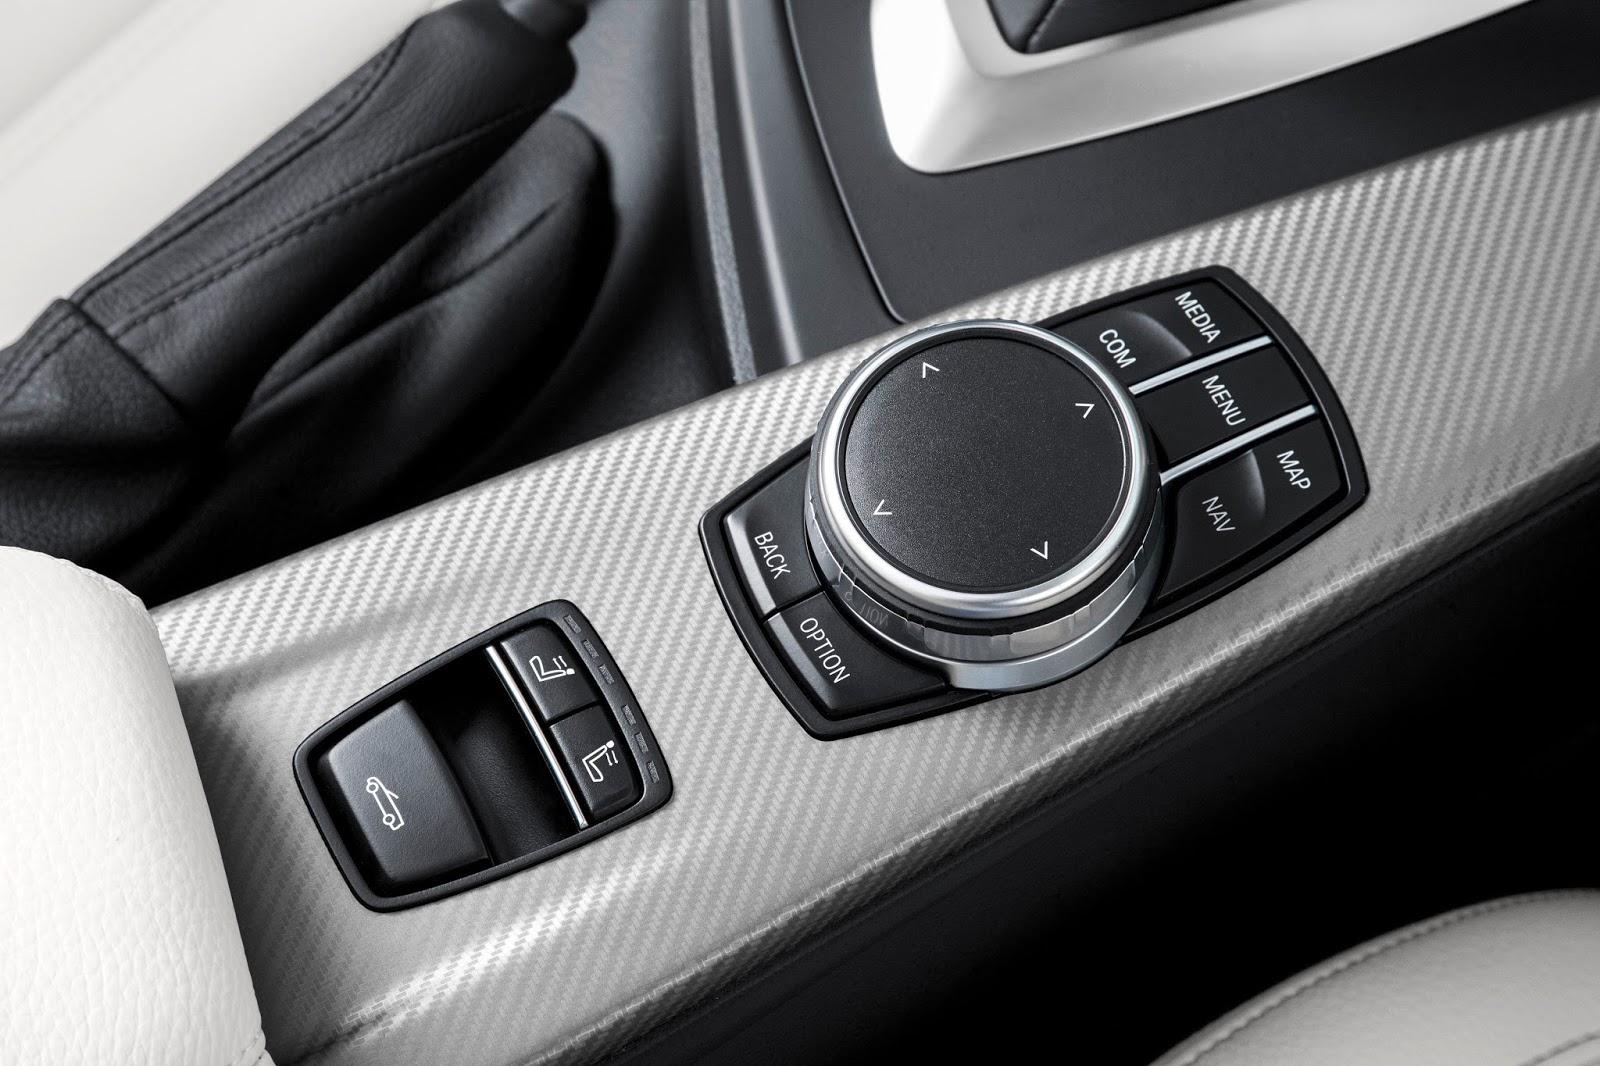 P90245306 highRes the new bmw series i Η νέα BMW Σειρά 4, με πιο σφιχτή ρύθμιση ανάρτησης BMW, Bmw 4, BMW 4 Cabrio, BMW 4 Coupe, BMW 4 Gran Coupé, Facelift